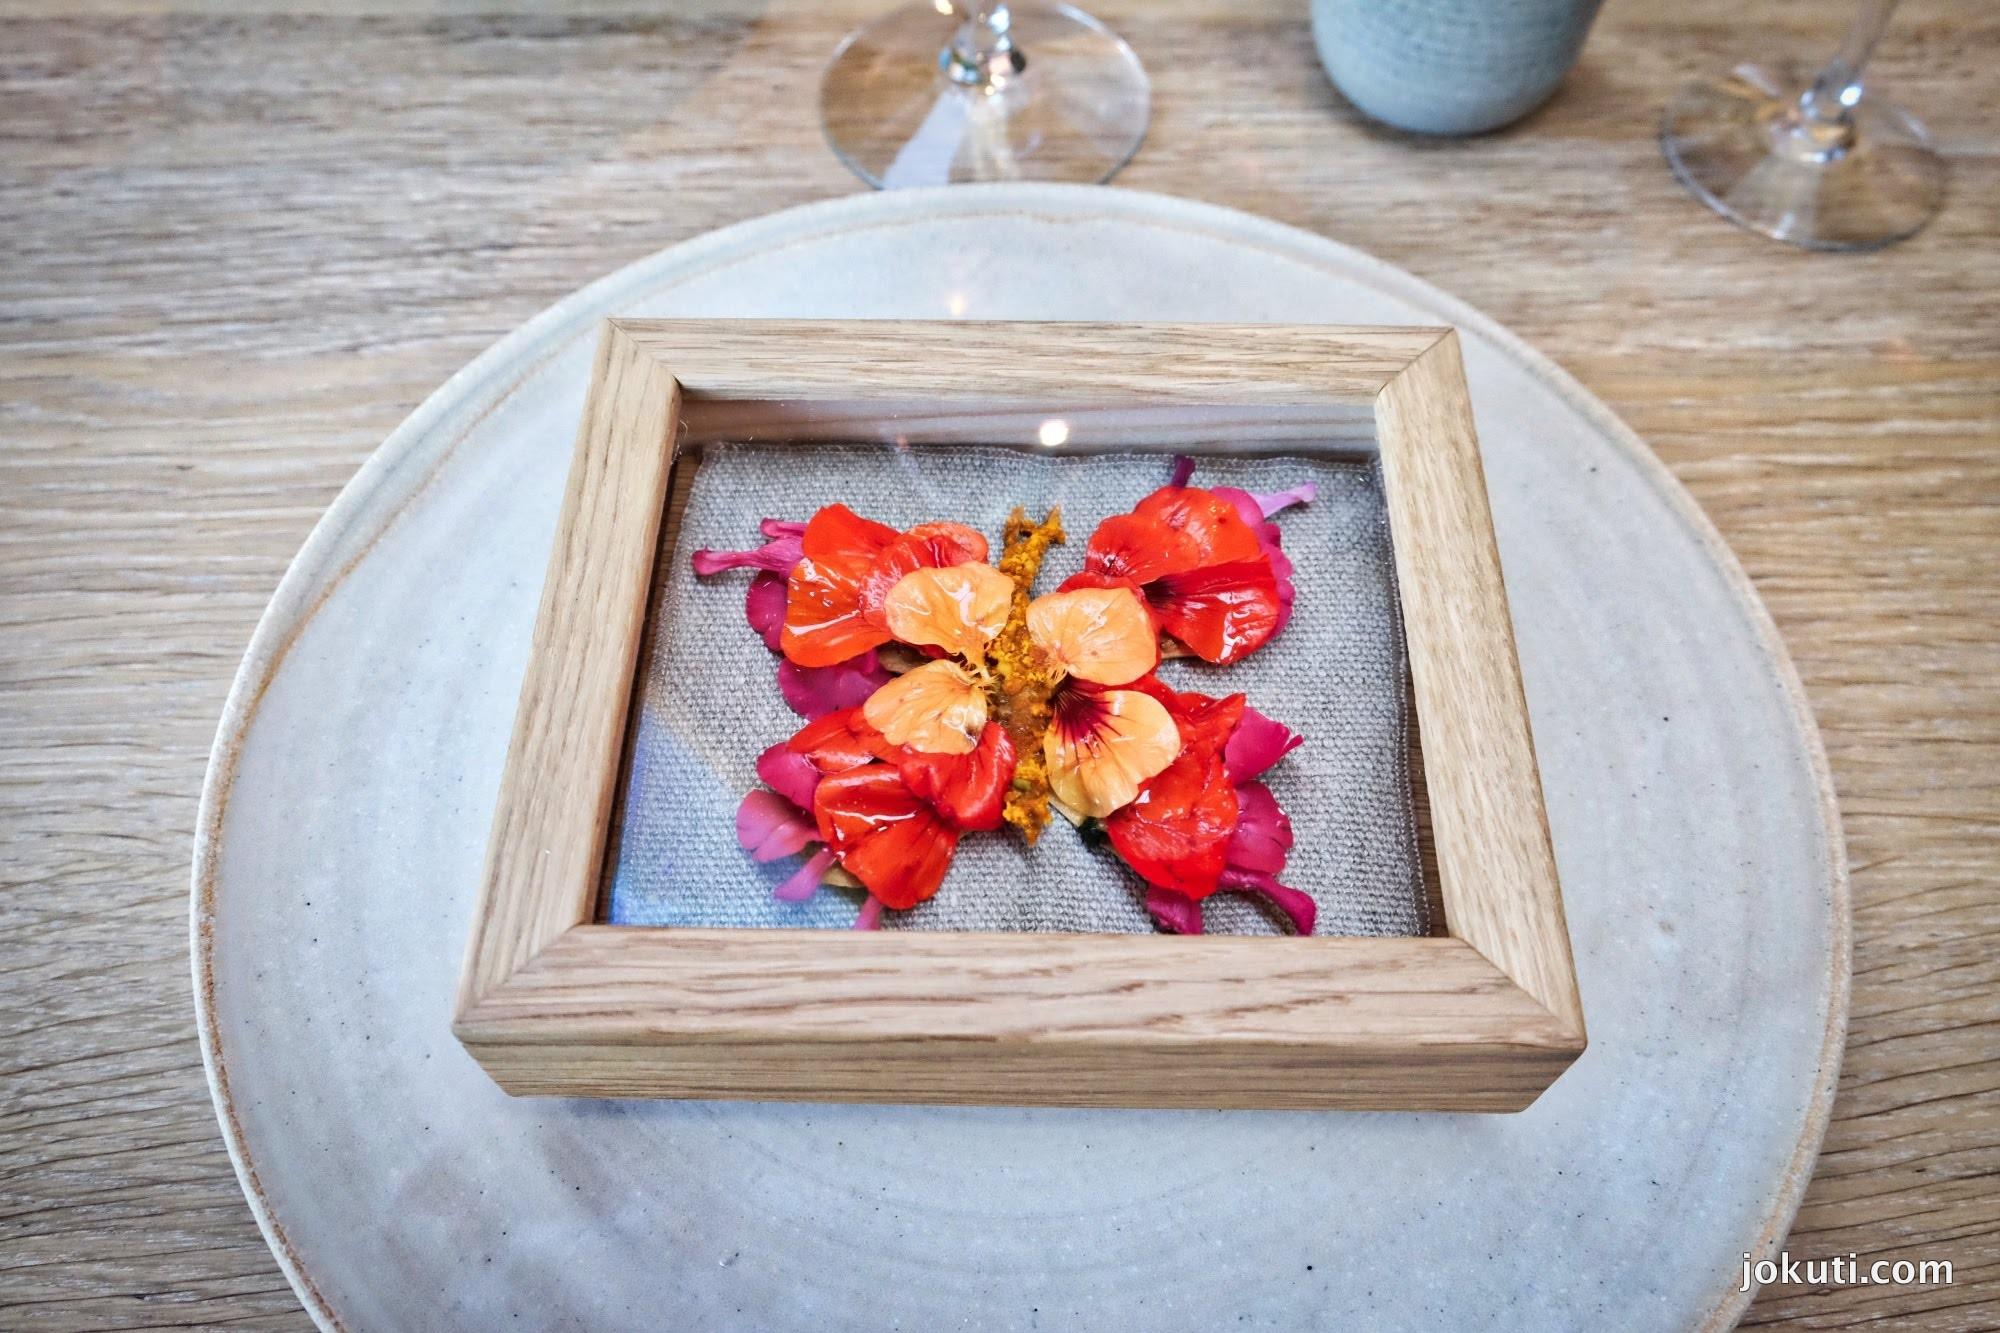 dscf6531_noma_copenhagen_vegeterian_plant_restaurant_redzepi_jokuti_vilagevo_l.jpg